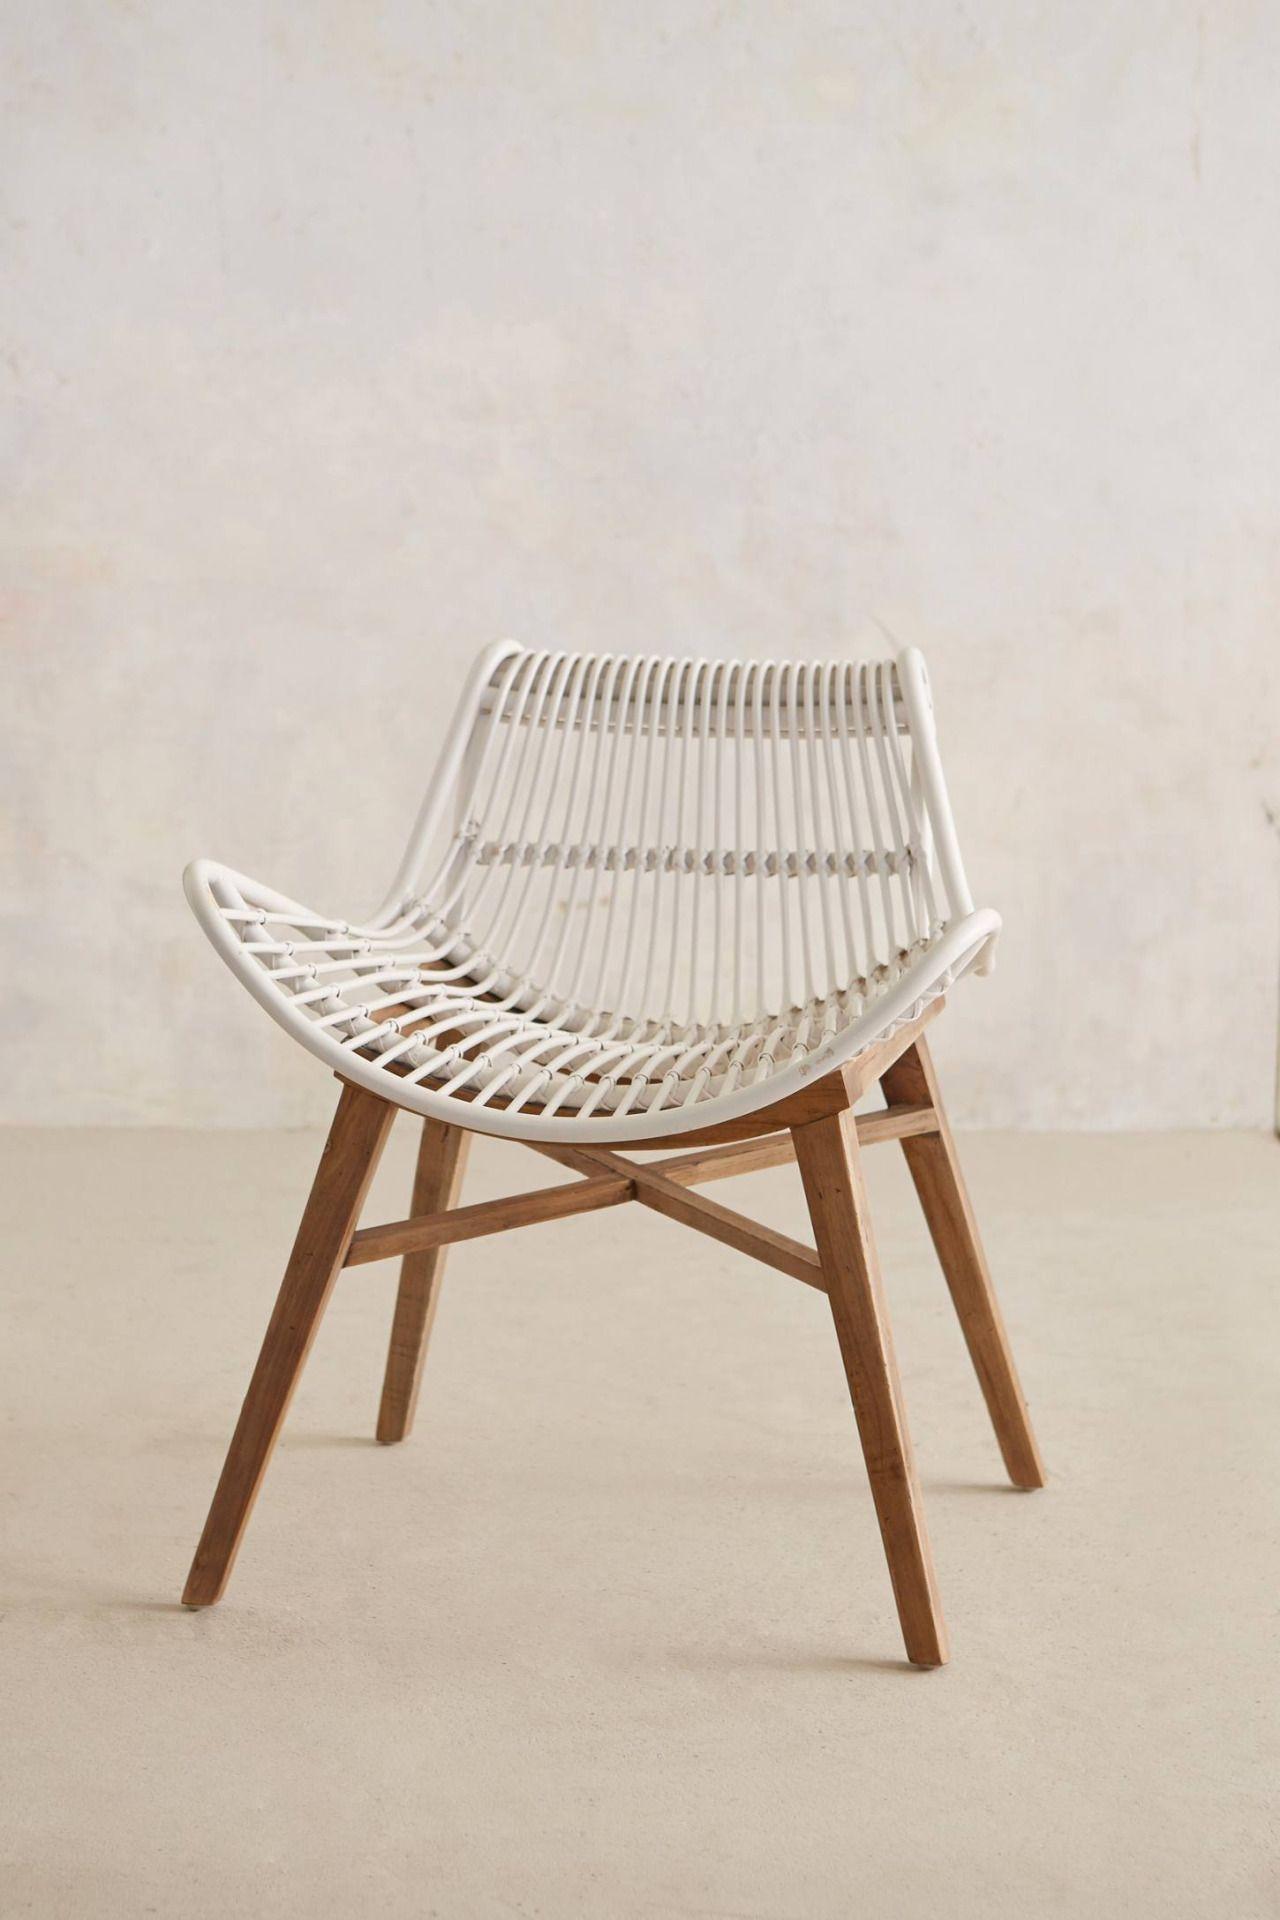 Scrolled rattan chair Anthropologie wish list